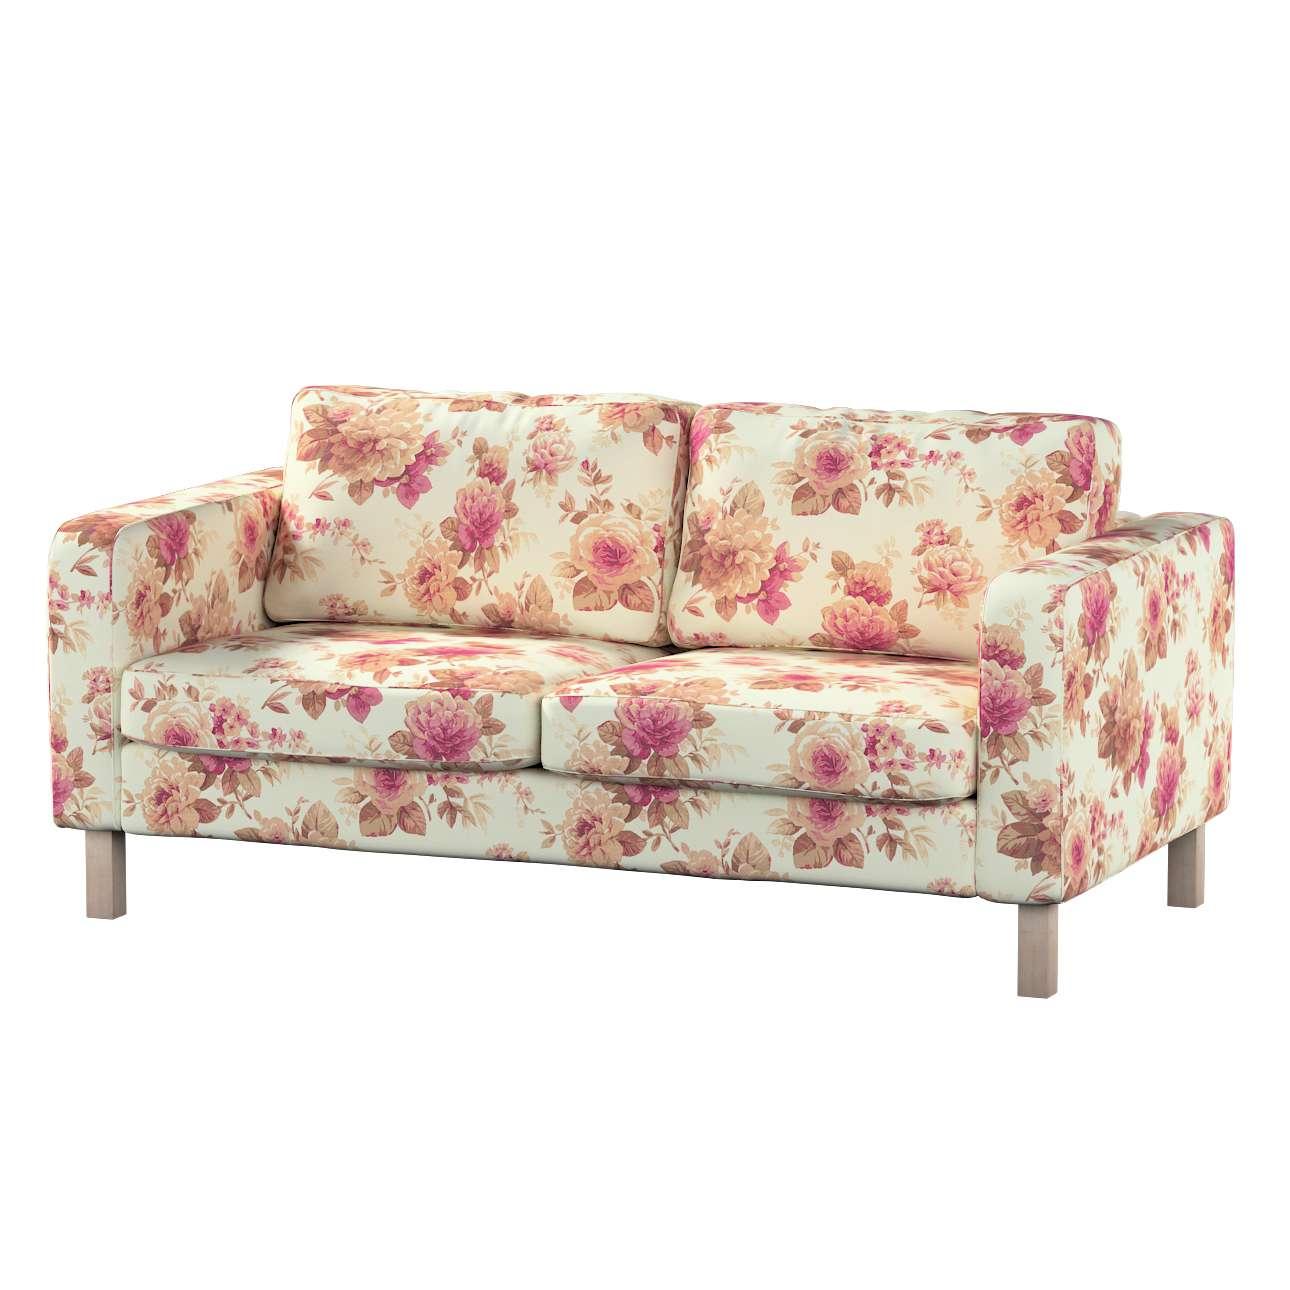 KARSLTAD dvivietės sofos užvalkalas Karlstad 2-vietės sofos užvalkalas kolekcijoje Mirella, audinys: 141-06